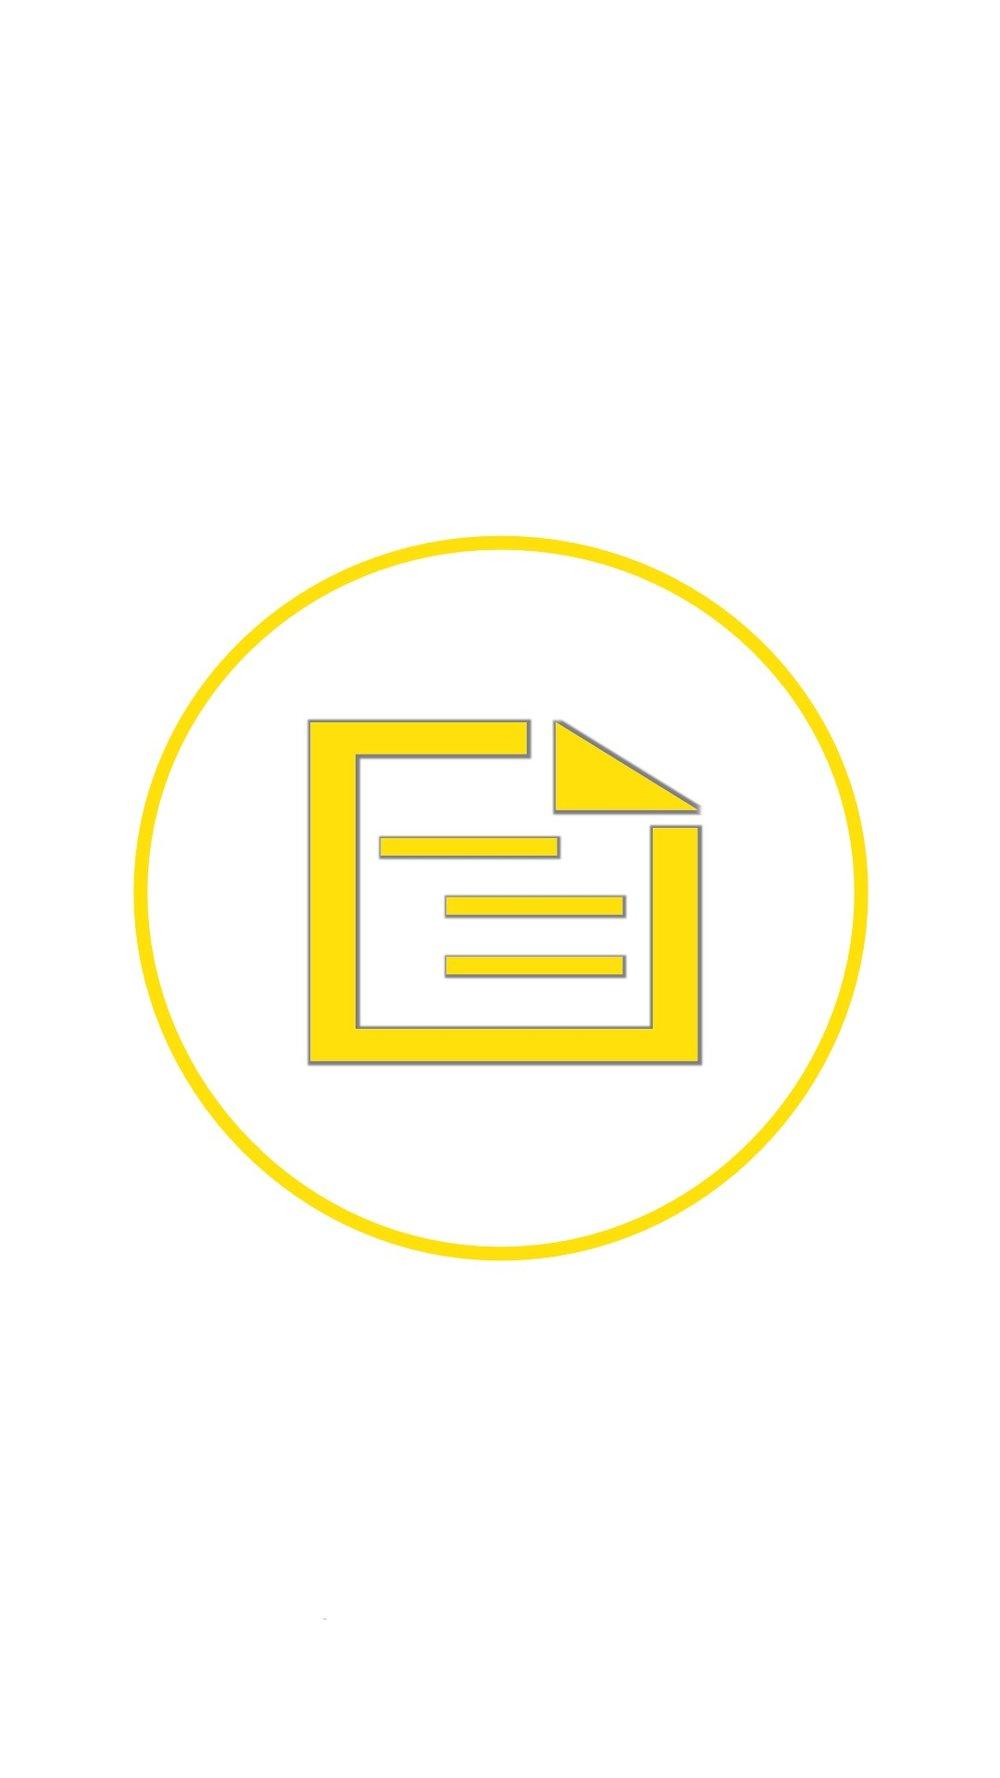 Instagram-cover-blogentry-yellow-lotnotes.com.jpg